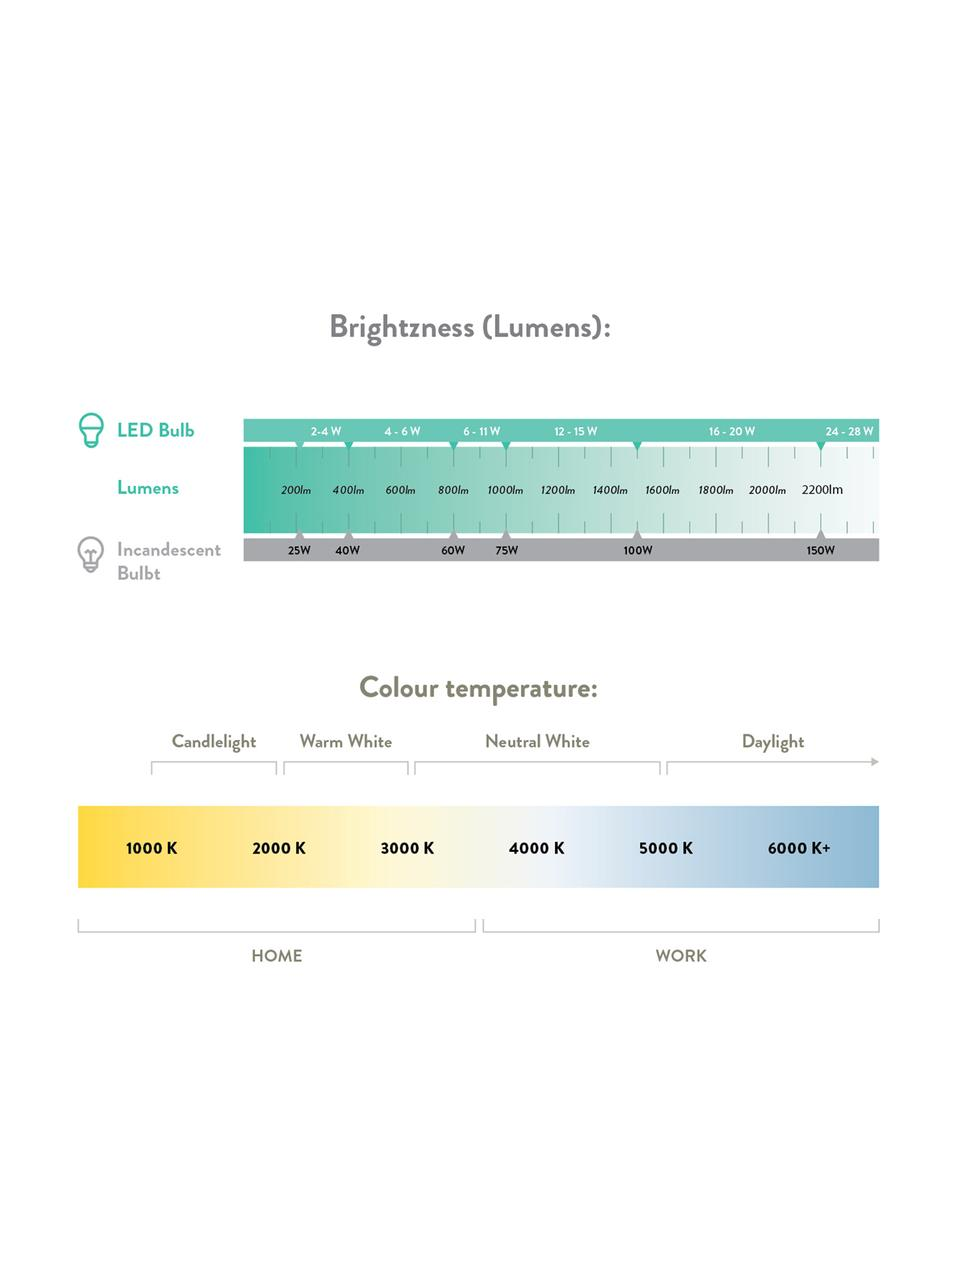 E27 Leuchtmittel, 3.5W, dimmbar, warmweiß, 1 Stück, Leuchtmittelschirm: Glas, Leuchtmittelfassung: Aluminium, Bernsteinfarben, transparent, Ø 6 x H 14 cm